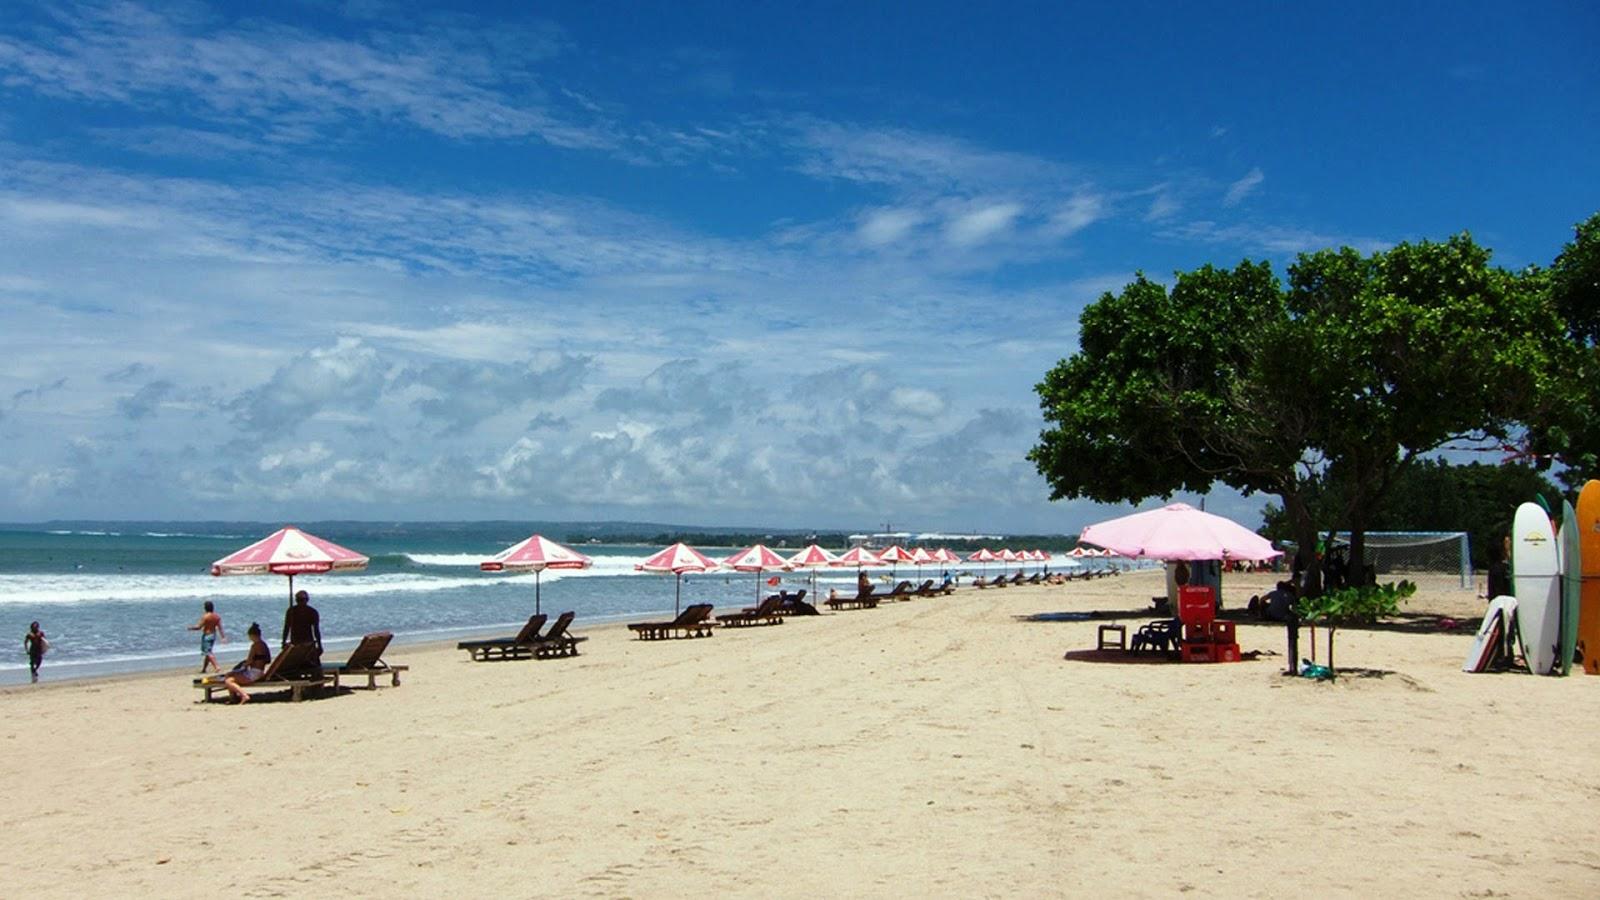 Wisata Pantai Putih Dreamland